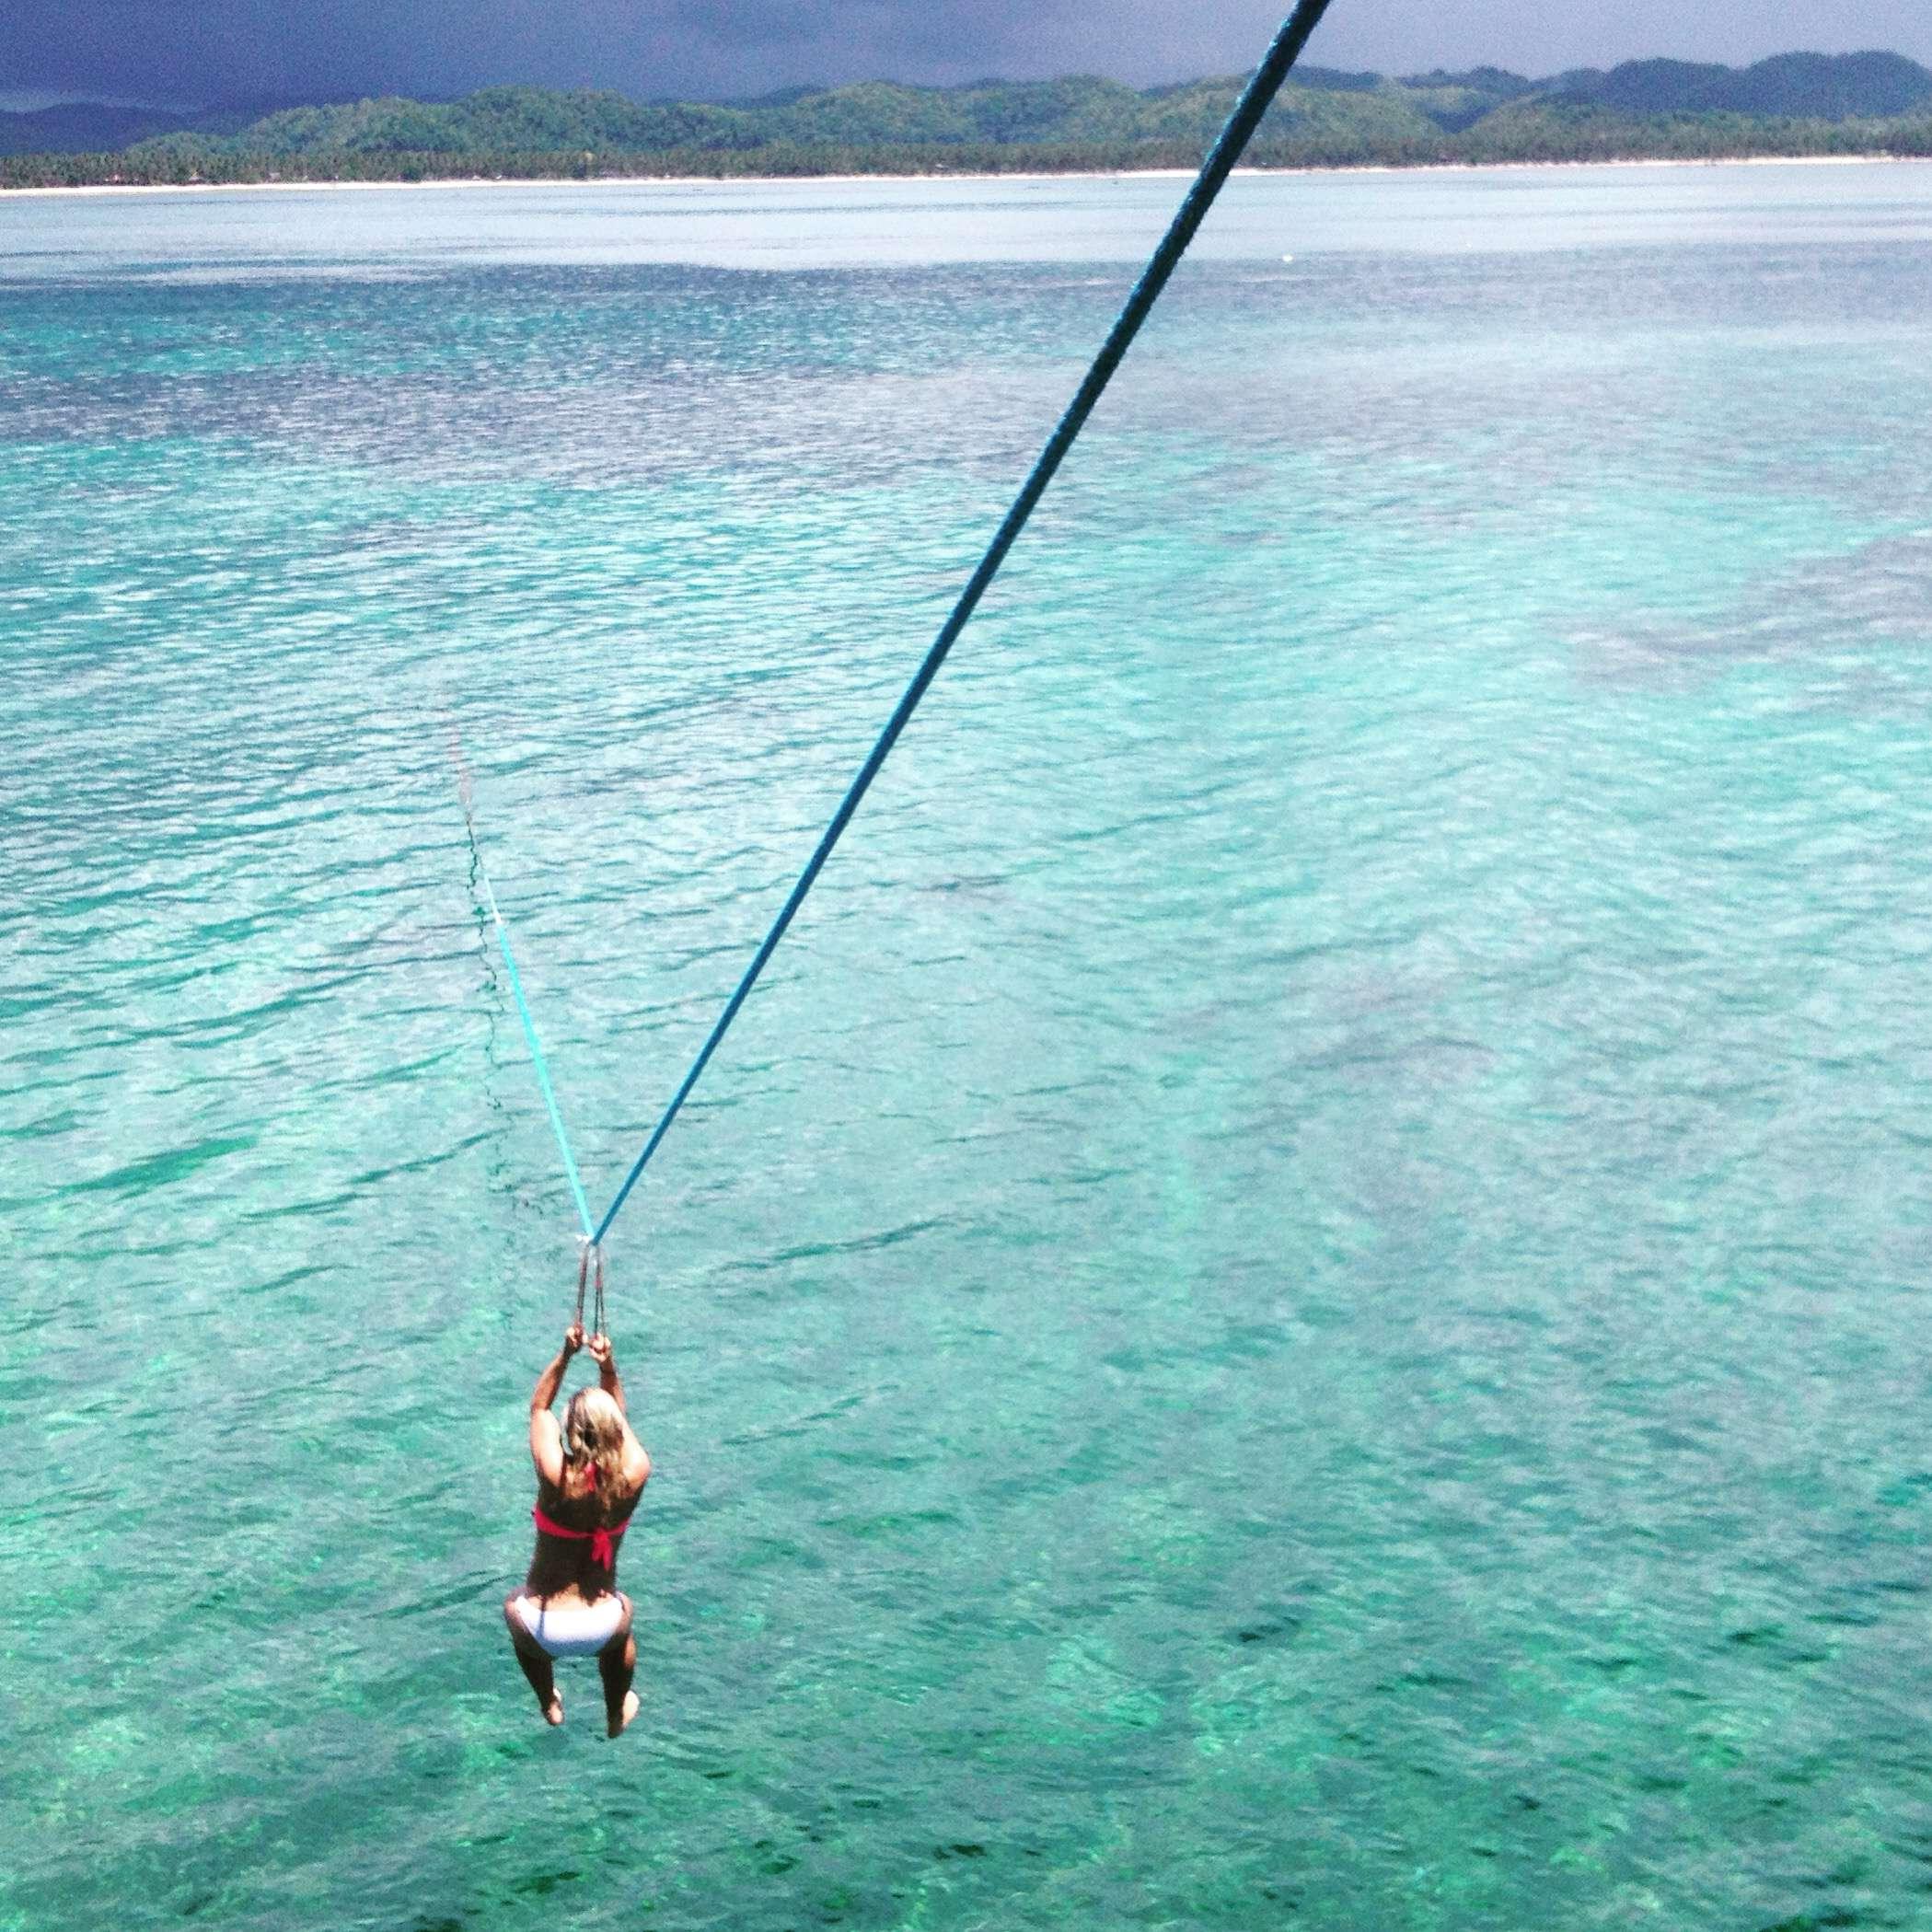 Zipline - Siargao île Philippines - Nomad Junkies